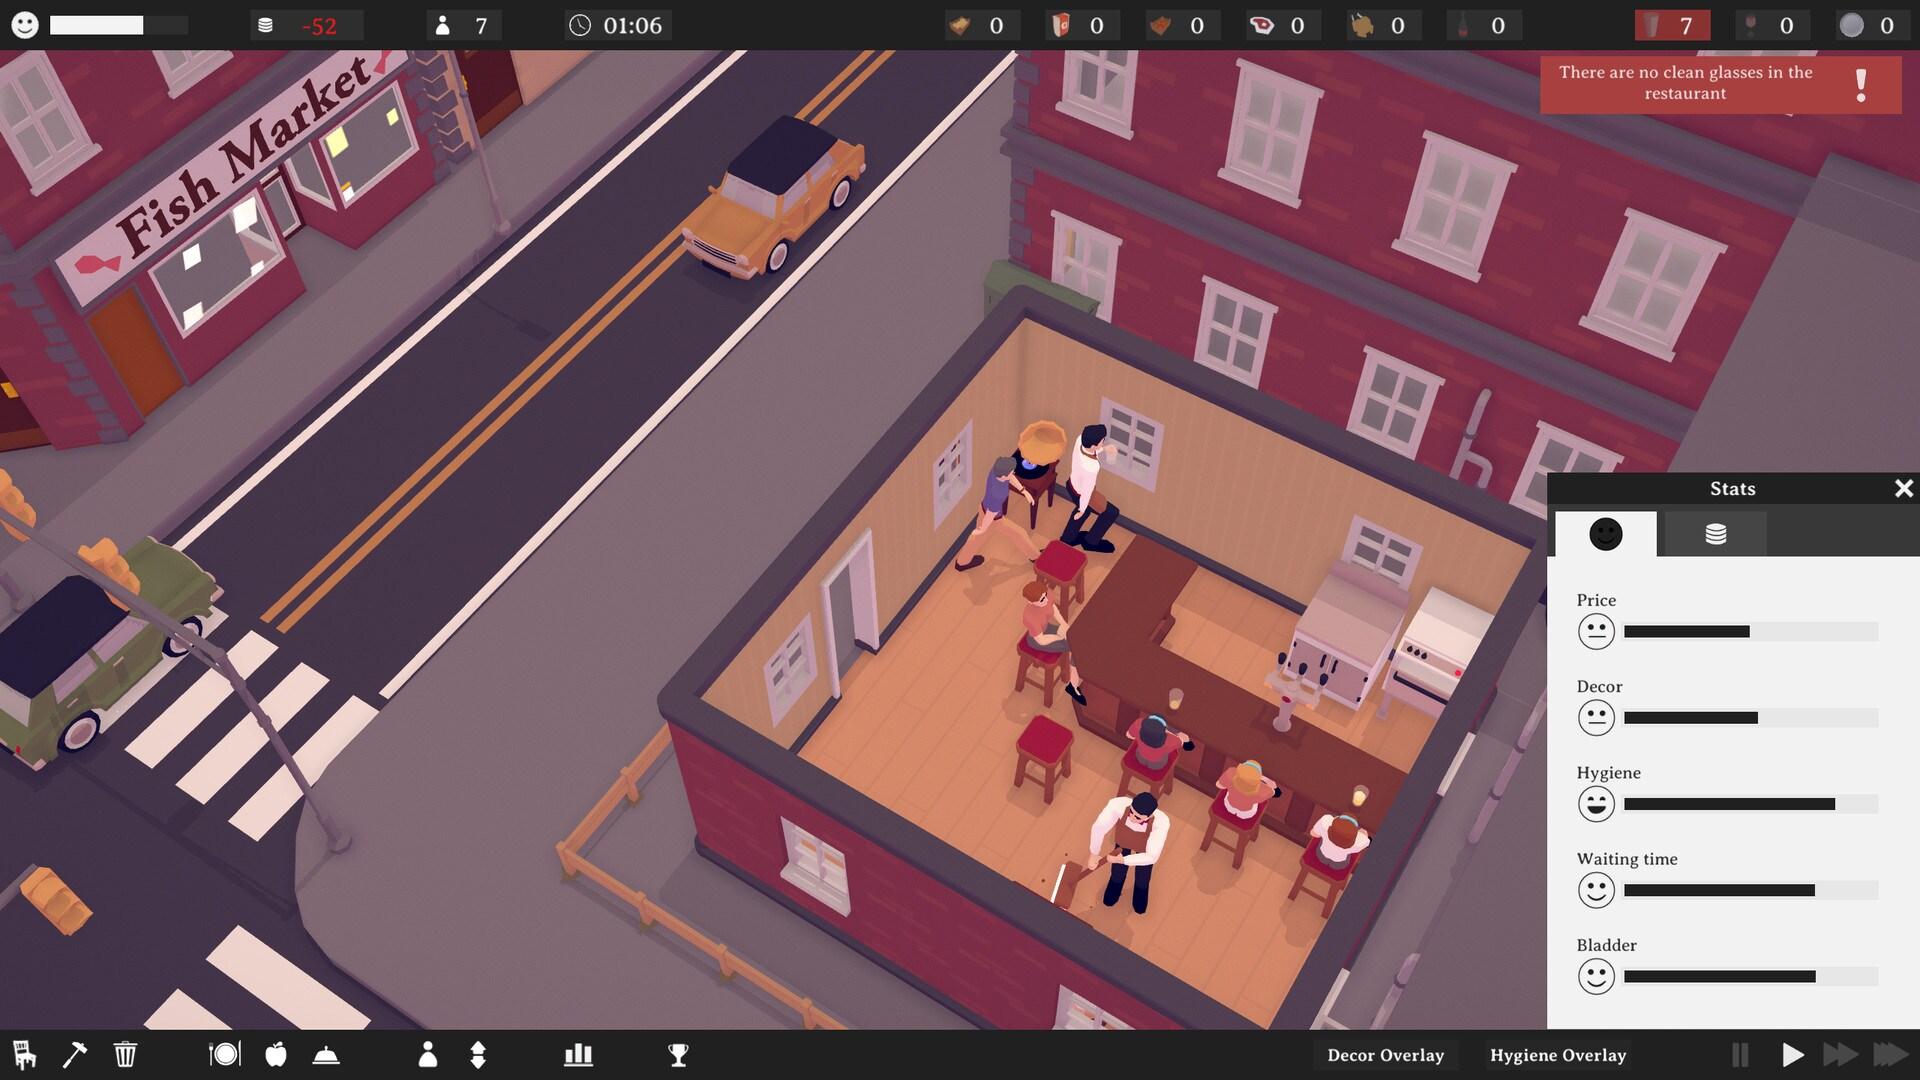 Buy TasteMaker: Restaurant simulator (PC) - Steam Gift - EUROPE - Cheap -  G2A.COM!